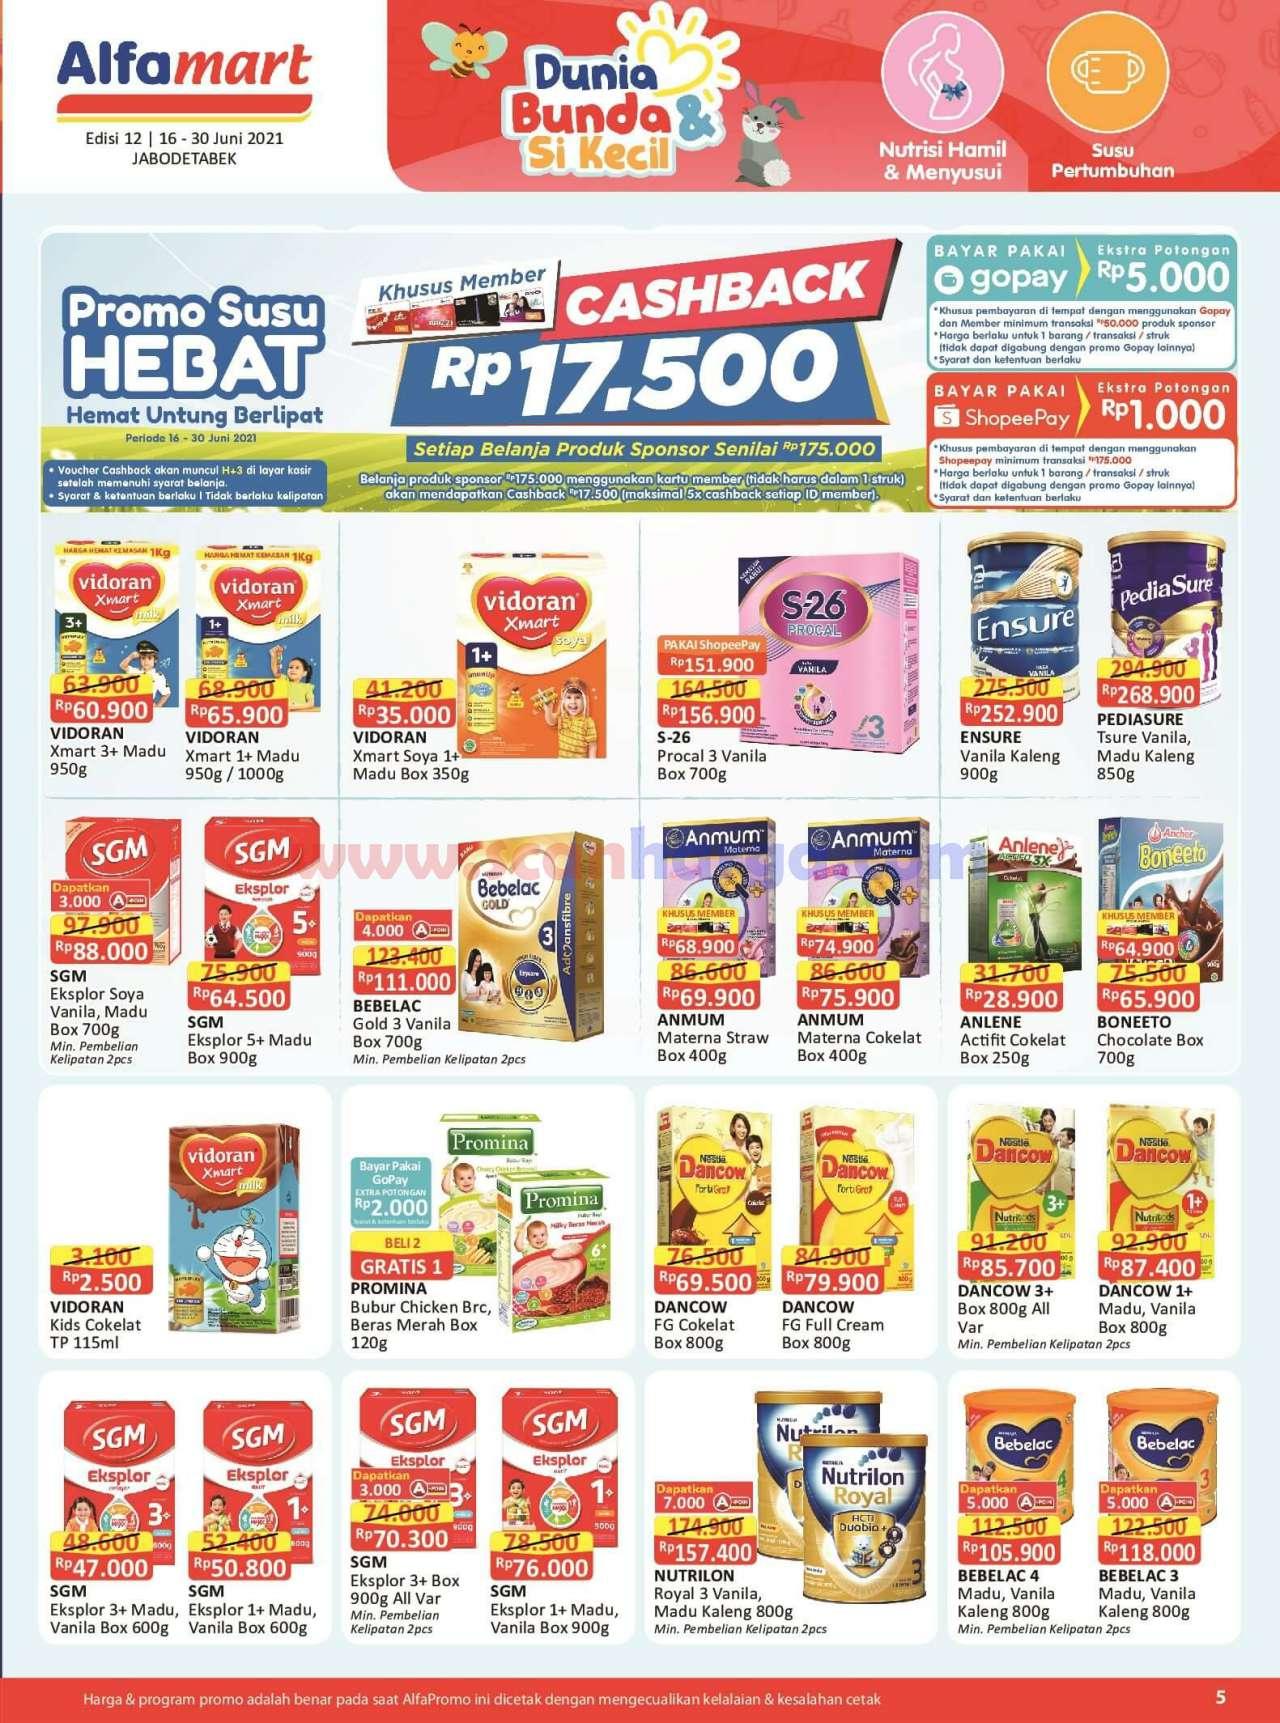 Katalog Promo Alfamart 16 - 30 Juni 2021 5